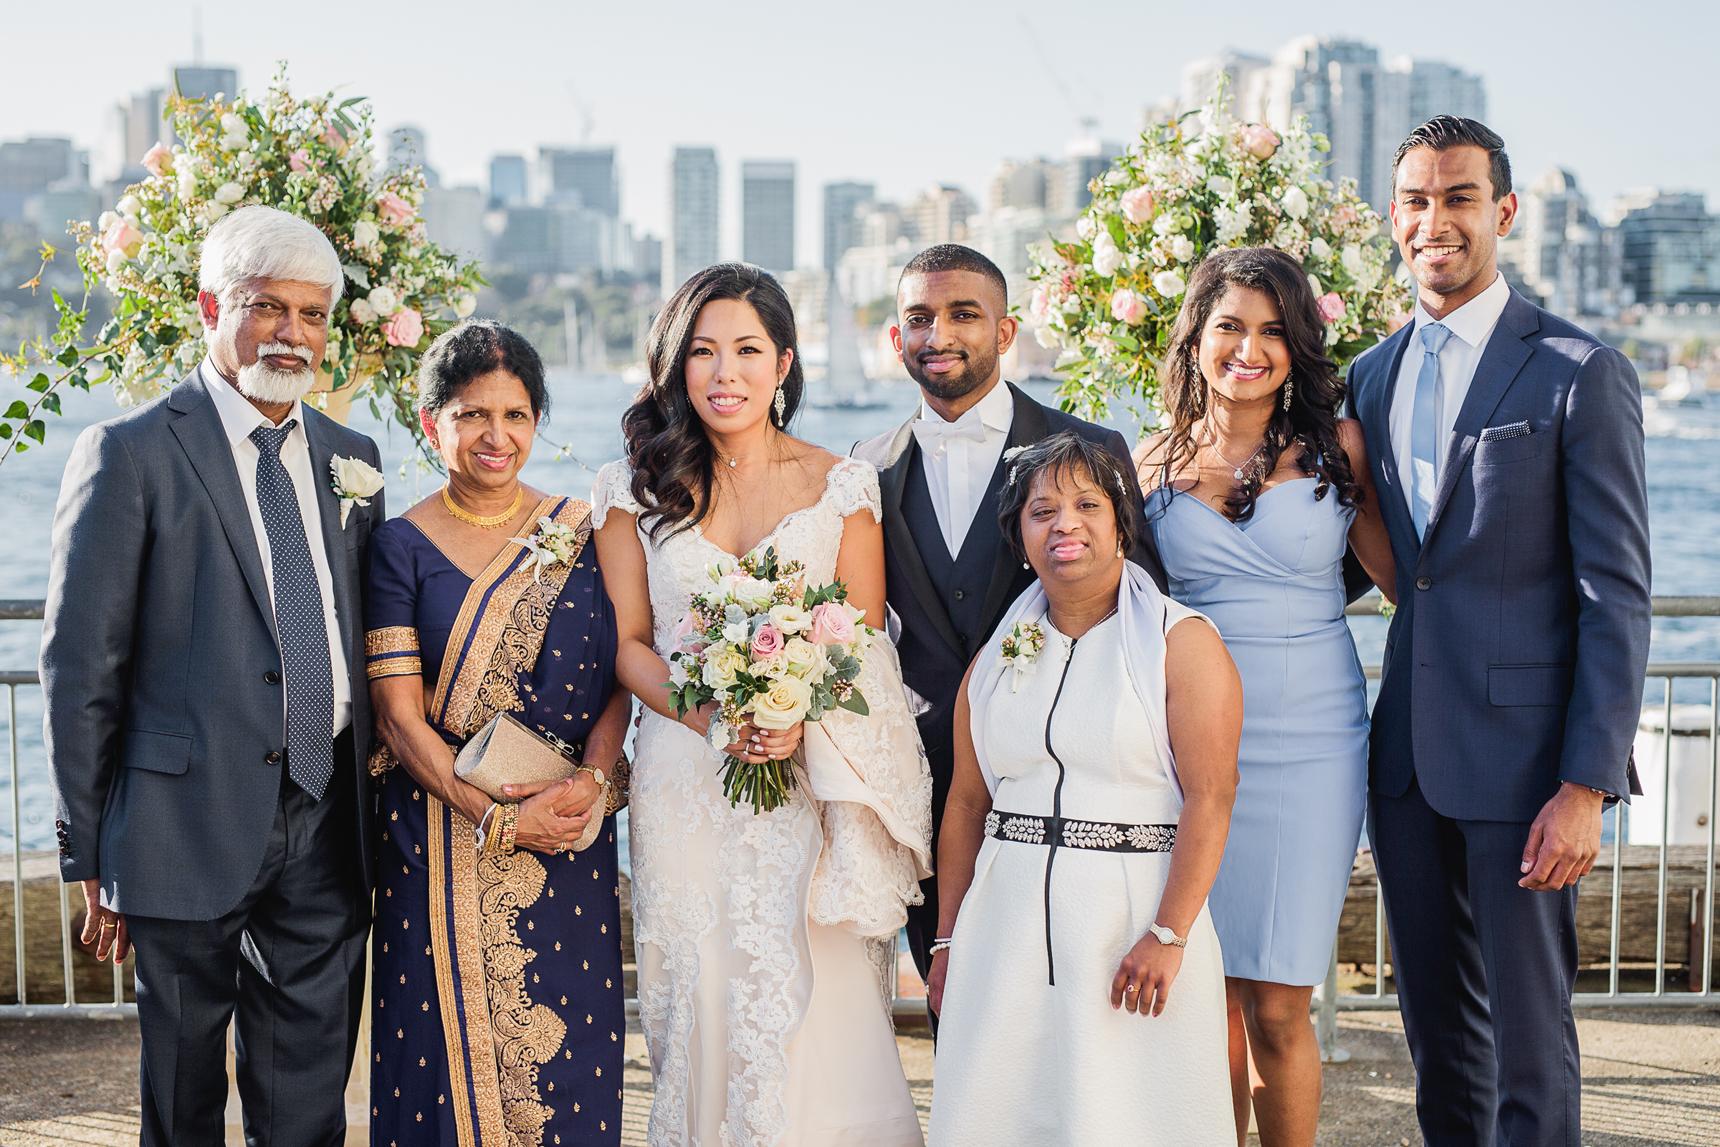 MJ_Pier_One_Sydney_Wedding_Photographer028.jpg